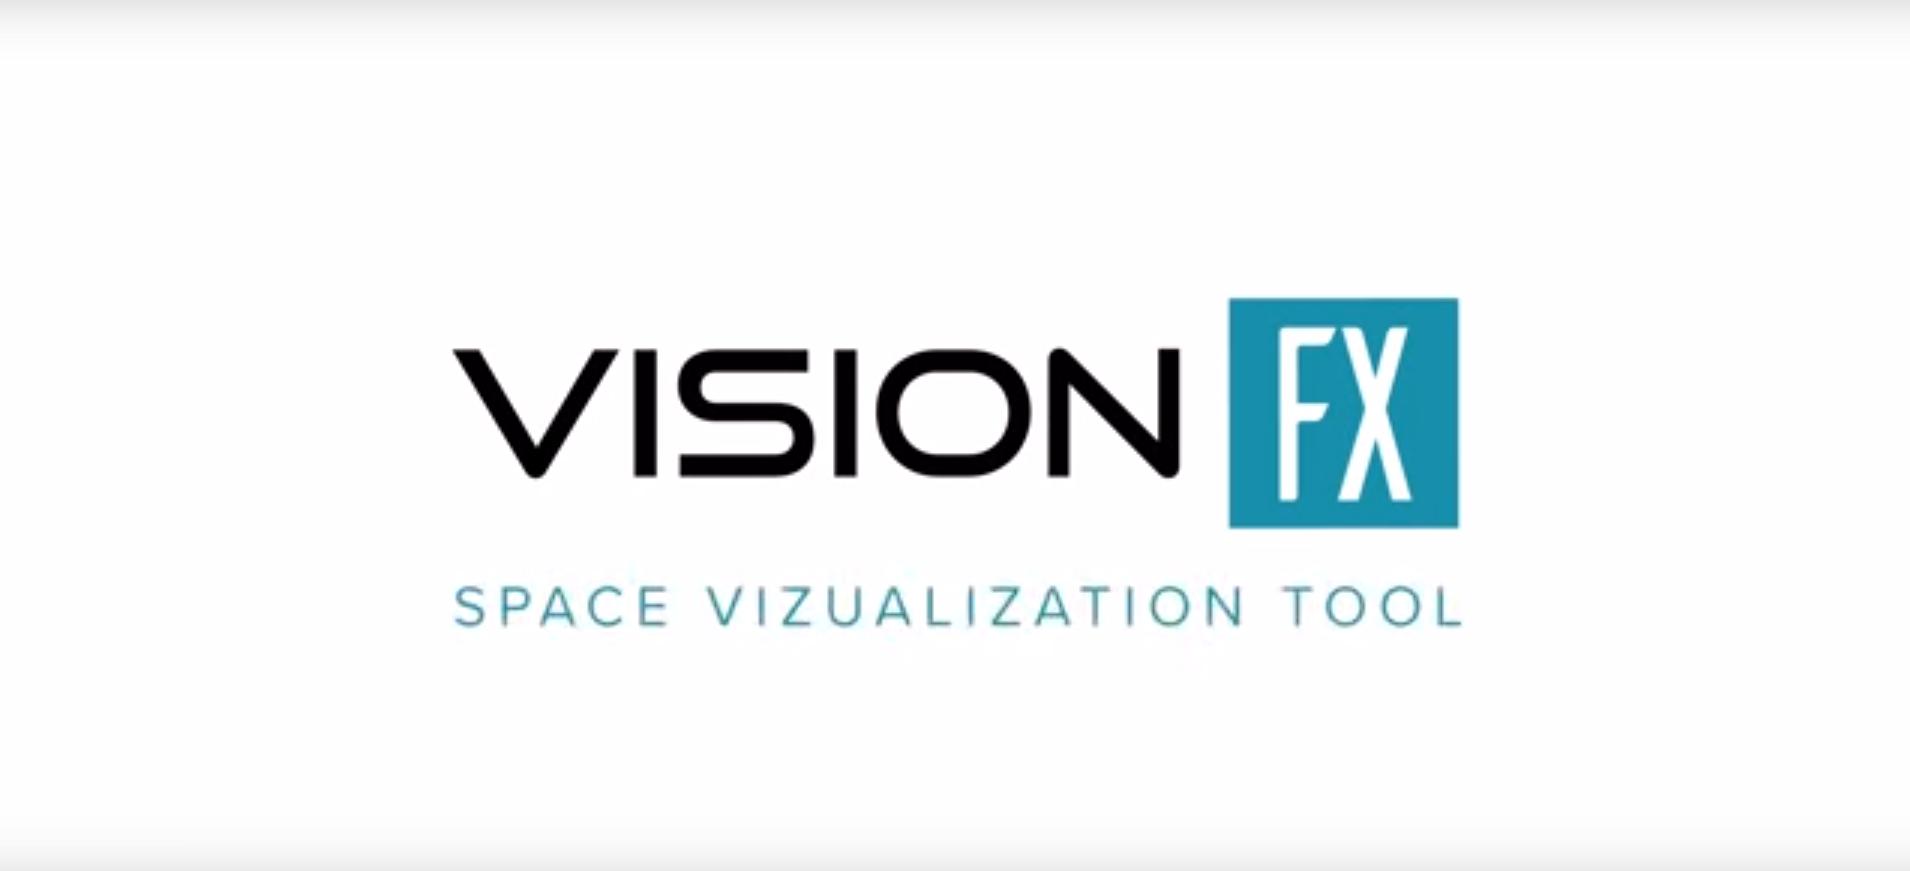 visionfx-2.png